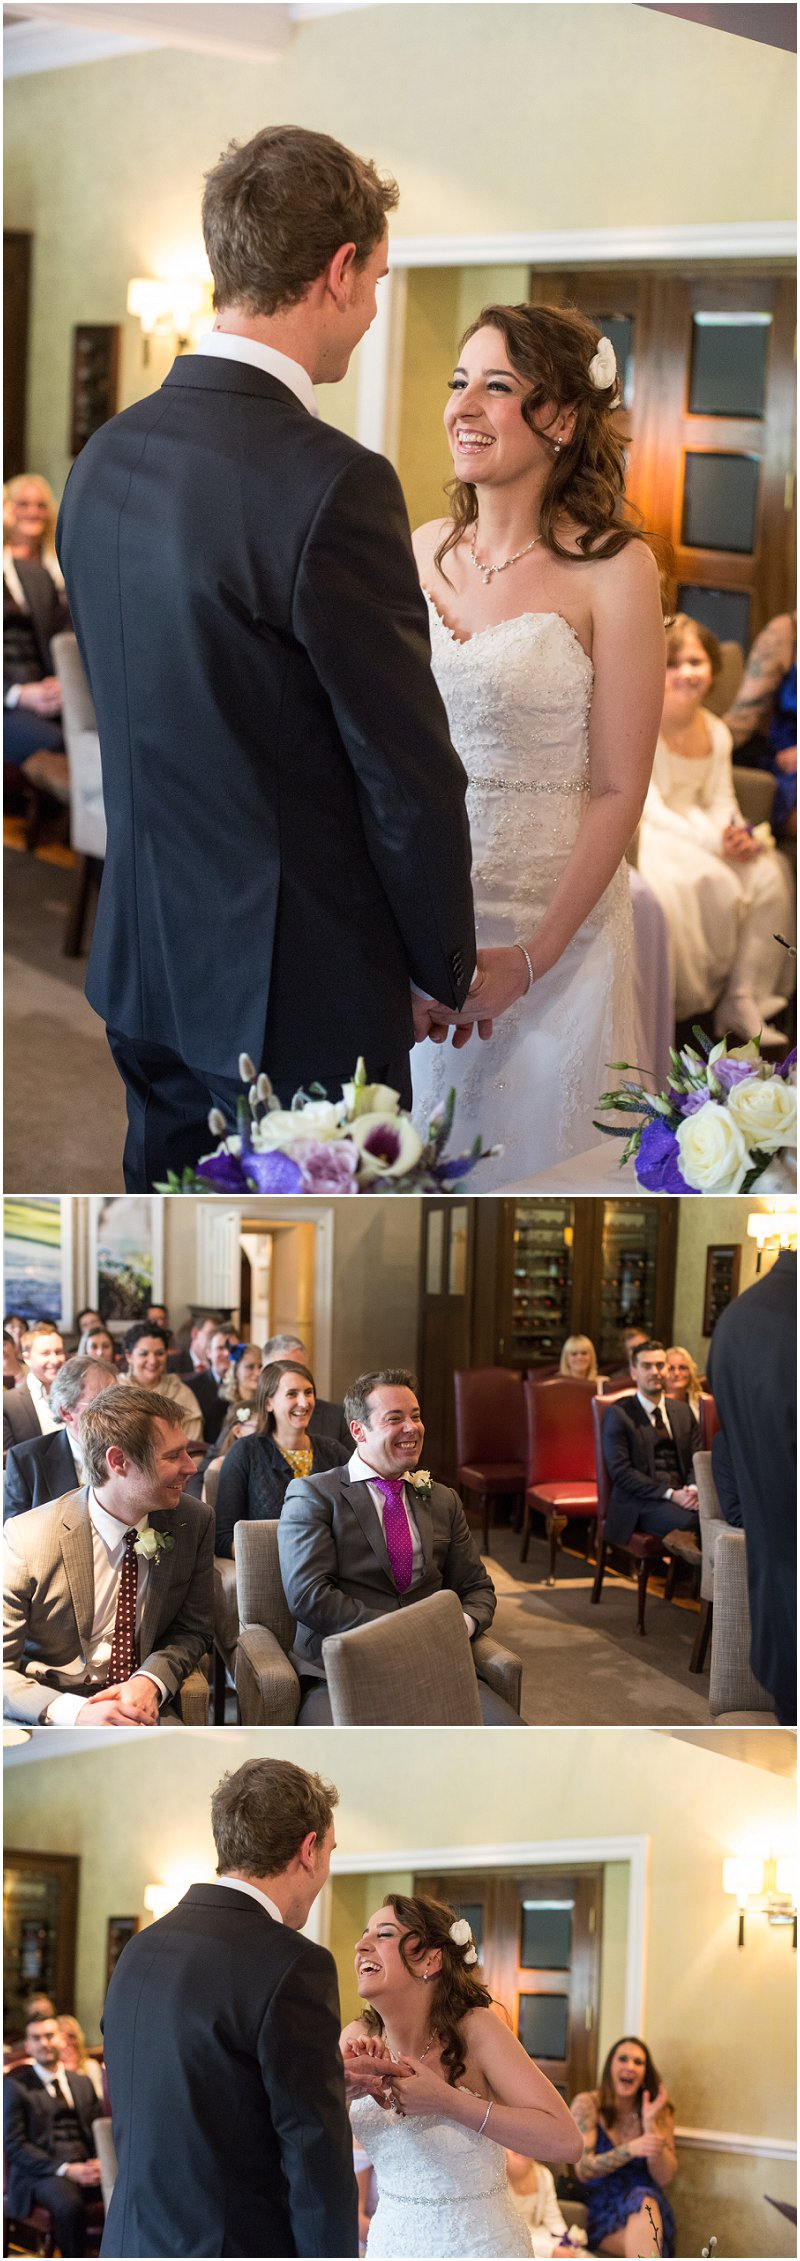 Wedding Ceremony at Linthwaite Hotel Cumbria